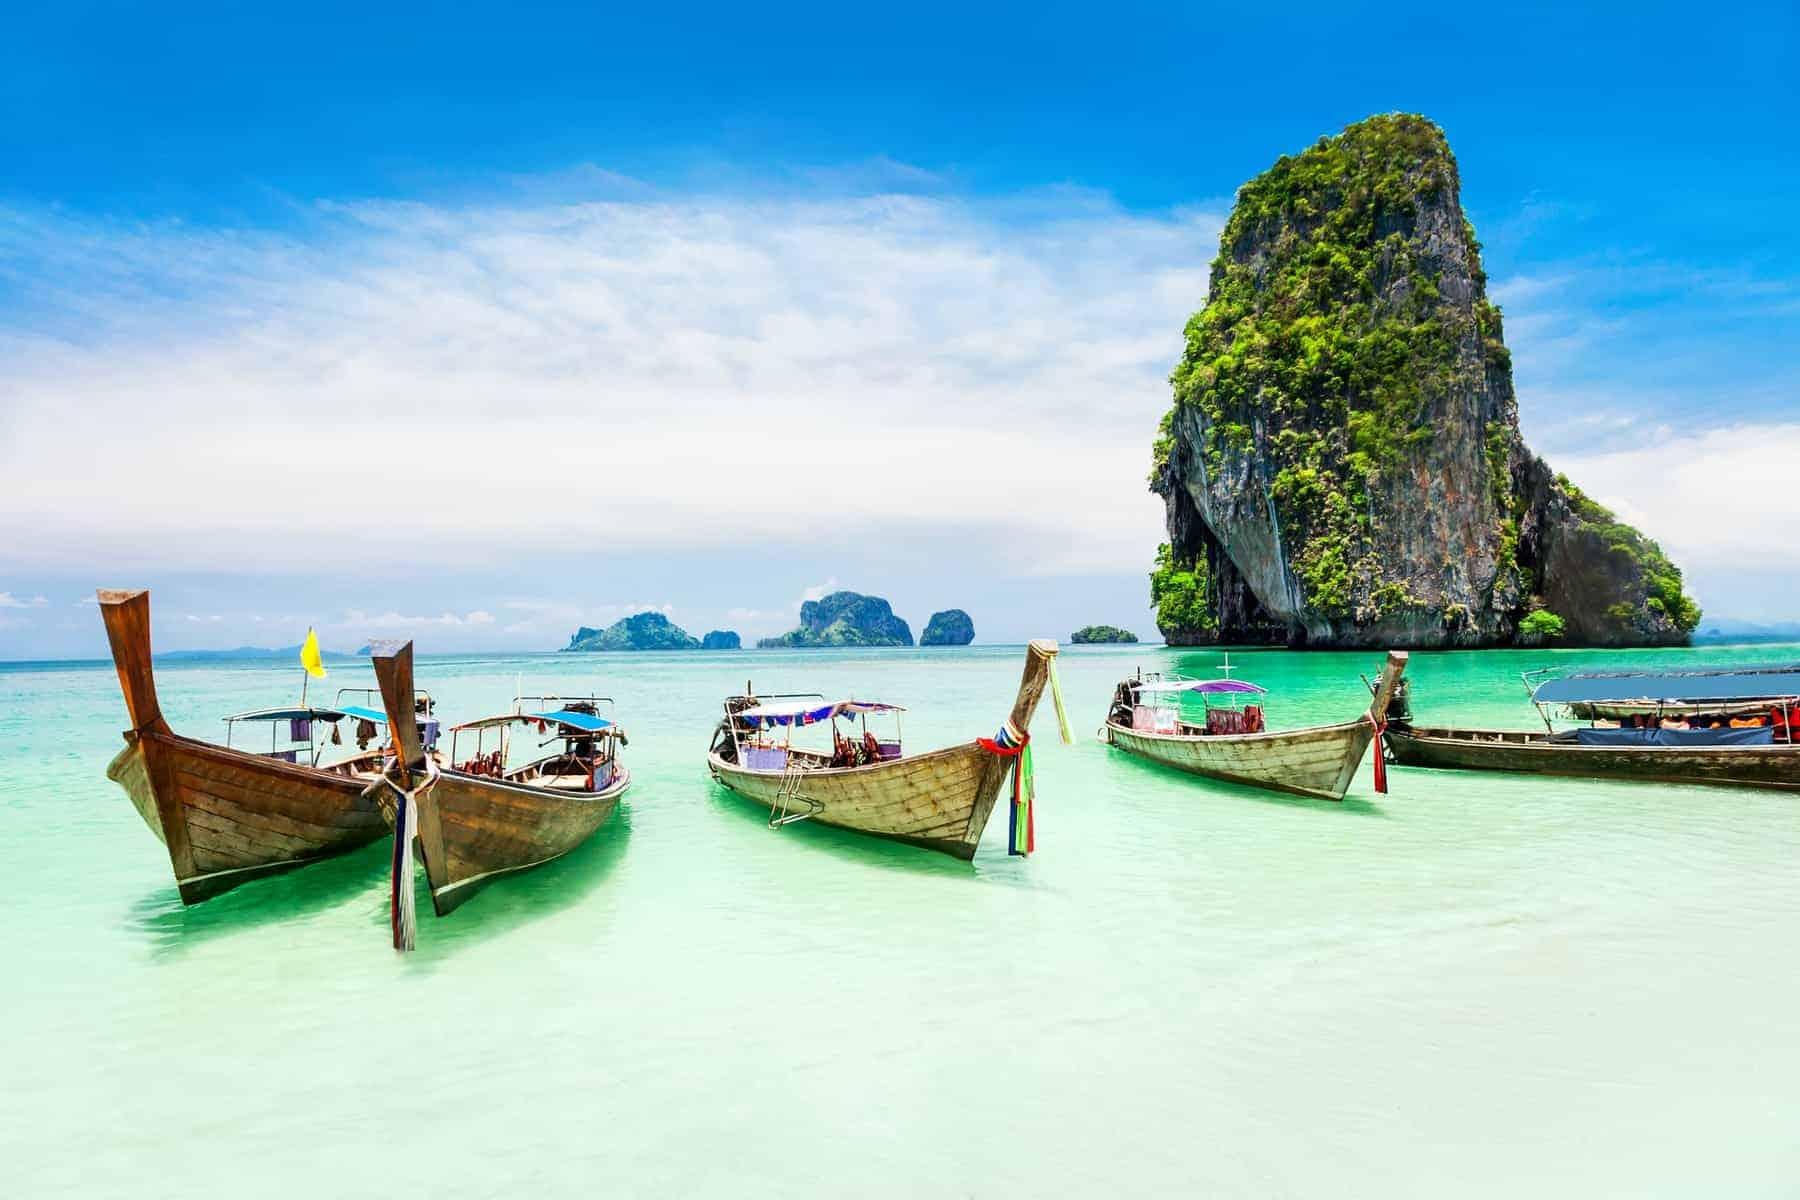 Phuket, Thailand, Longtale boat